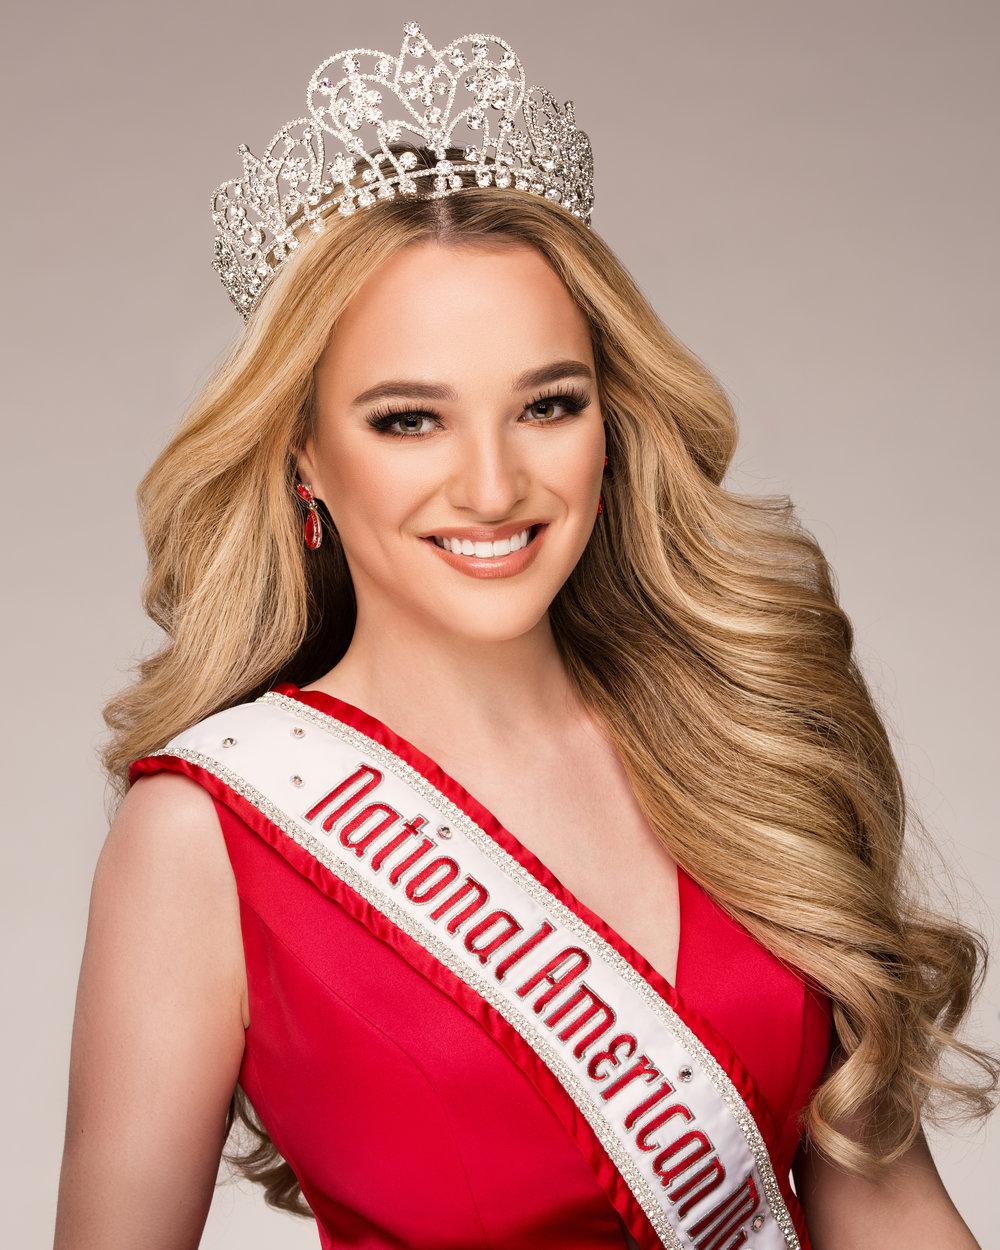 Kendra - 2019 National American Miss